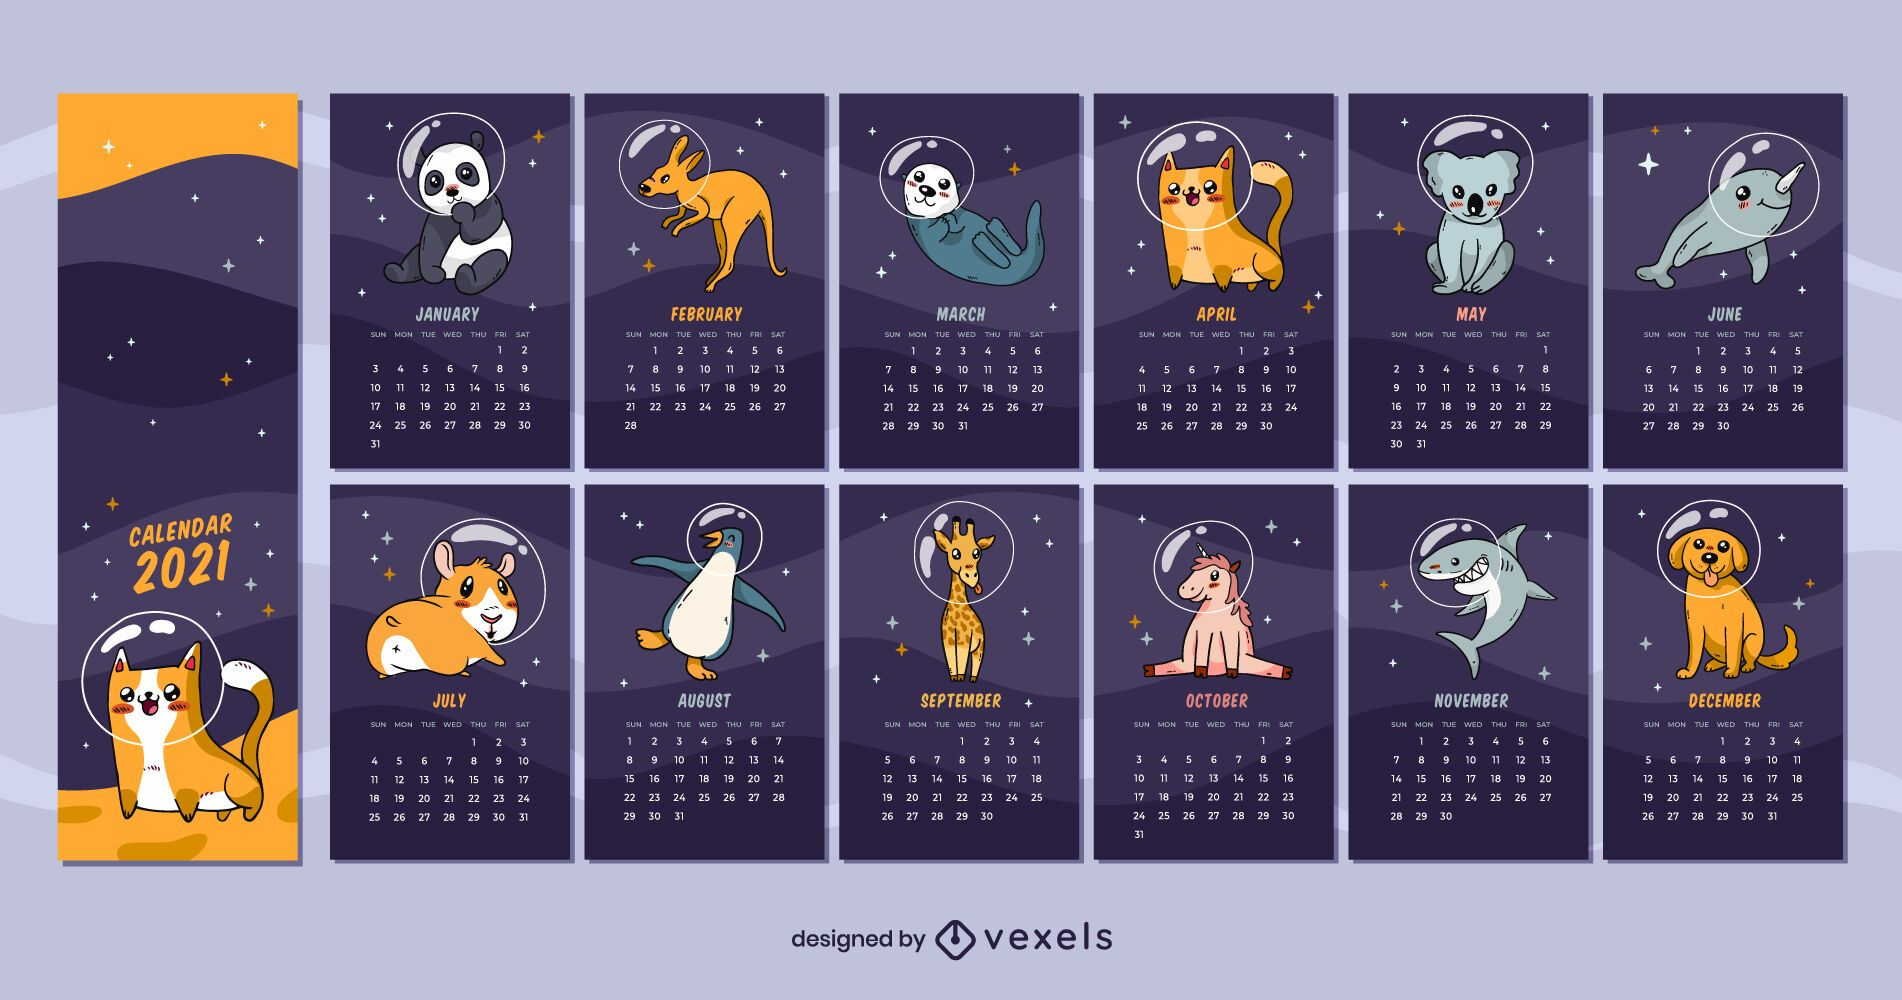 Space animals 2021 calendar design